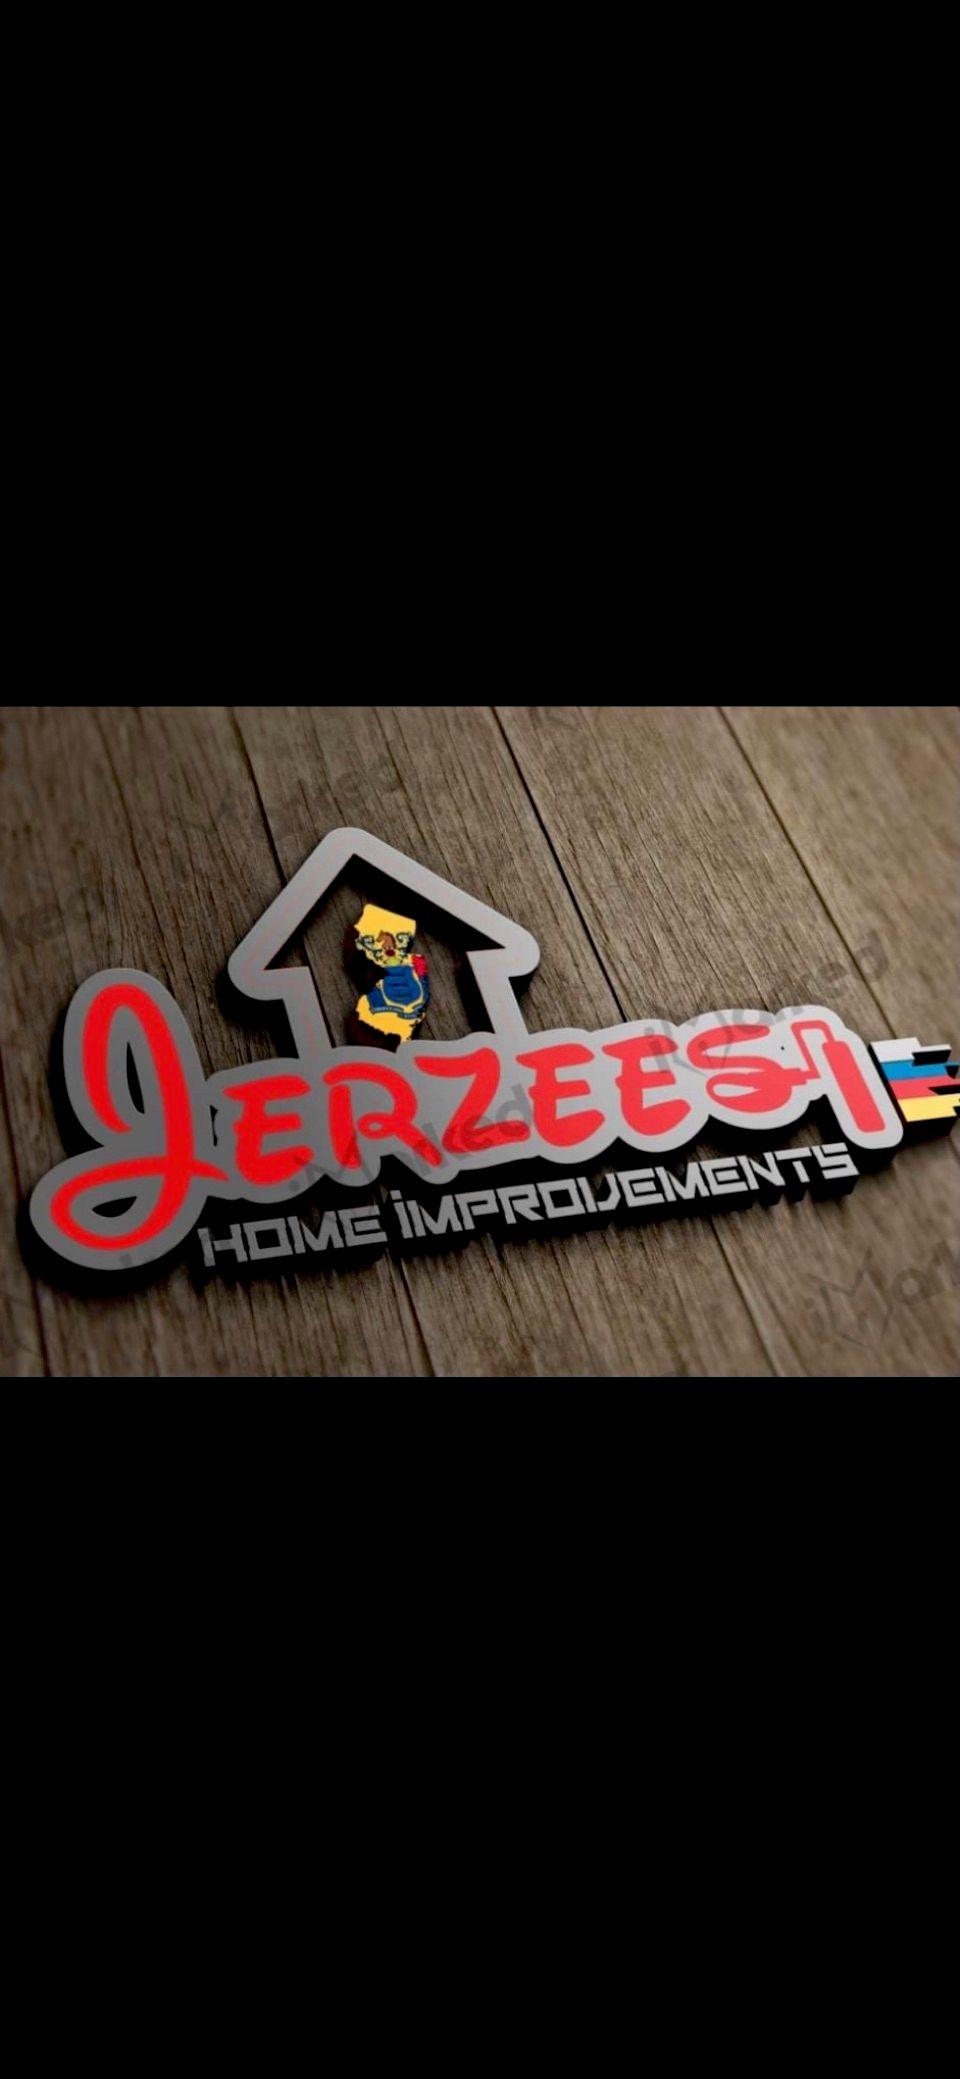 Jerzees Home Improvements LLC